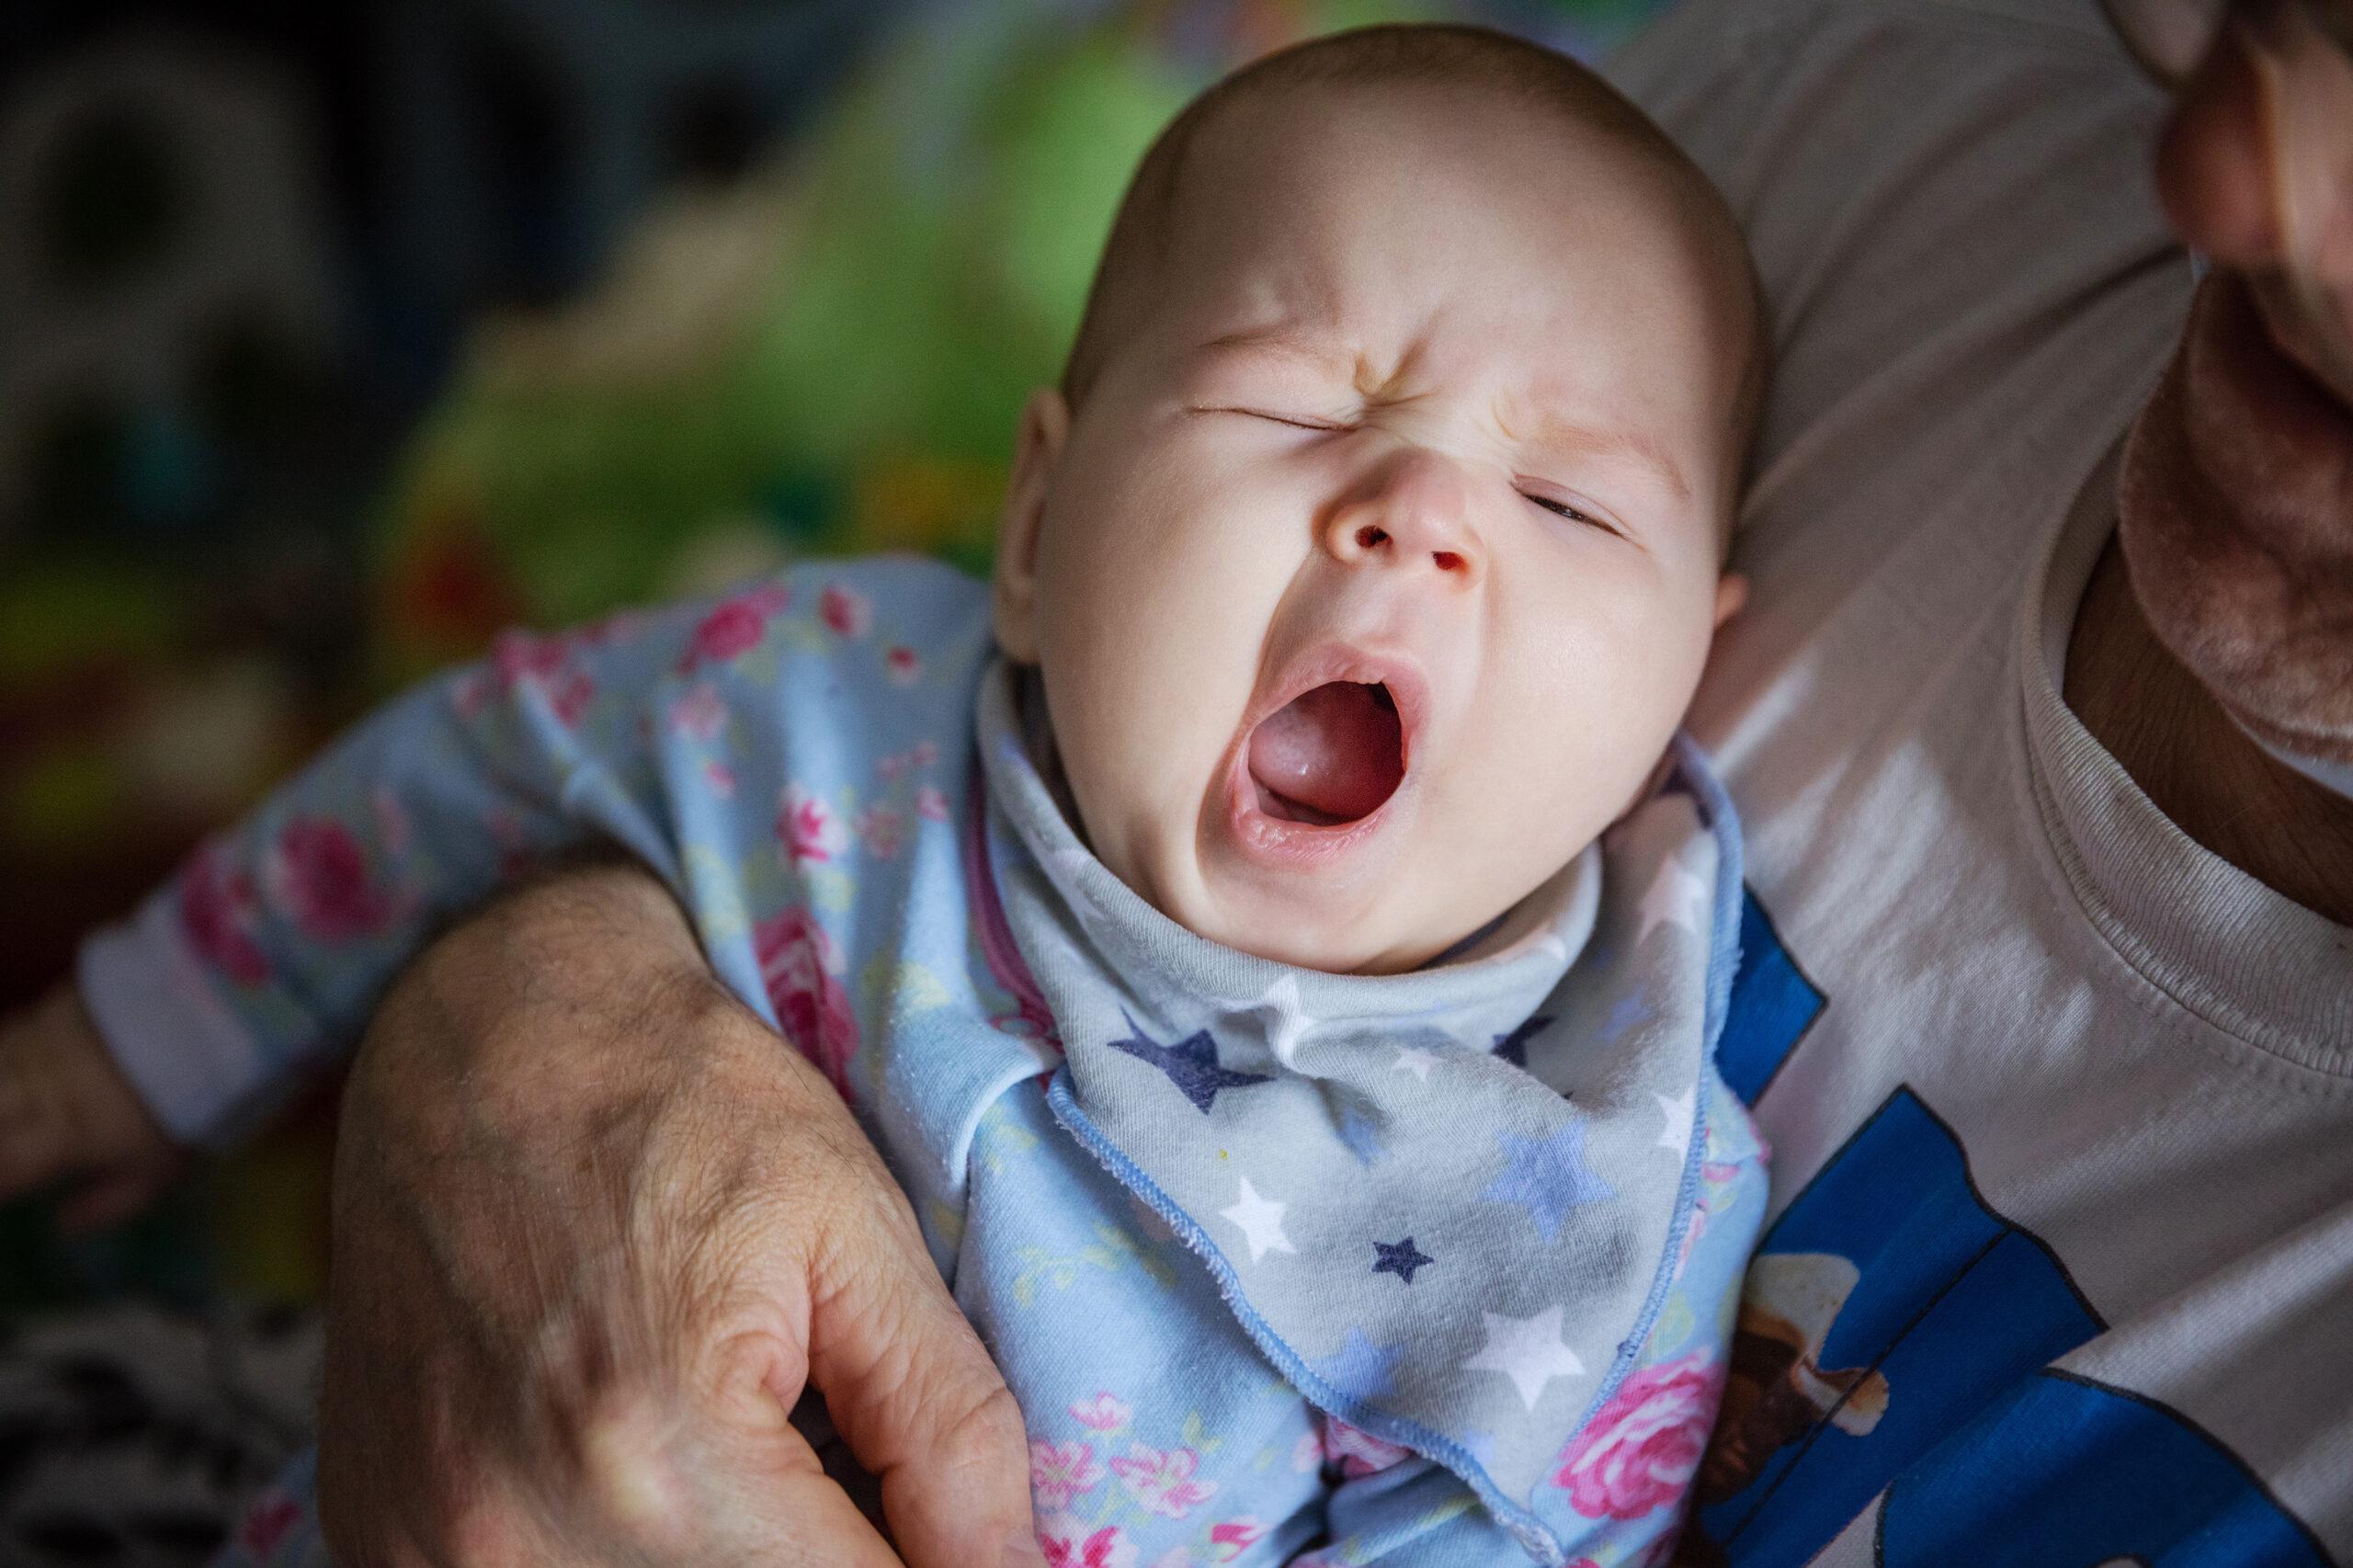 Baby girl yawning. Cropped view of grandfather rocking baby to sleep.